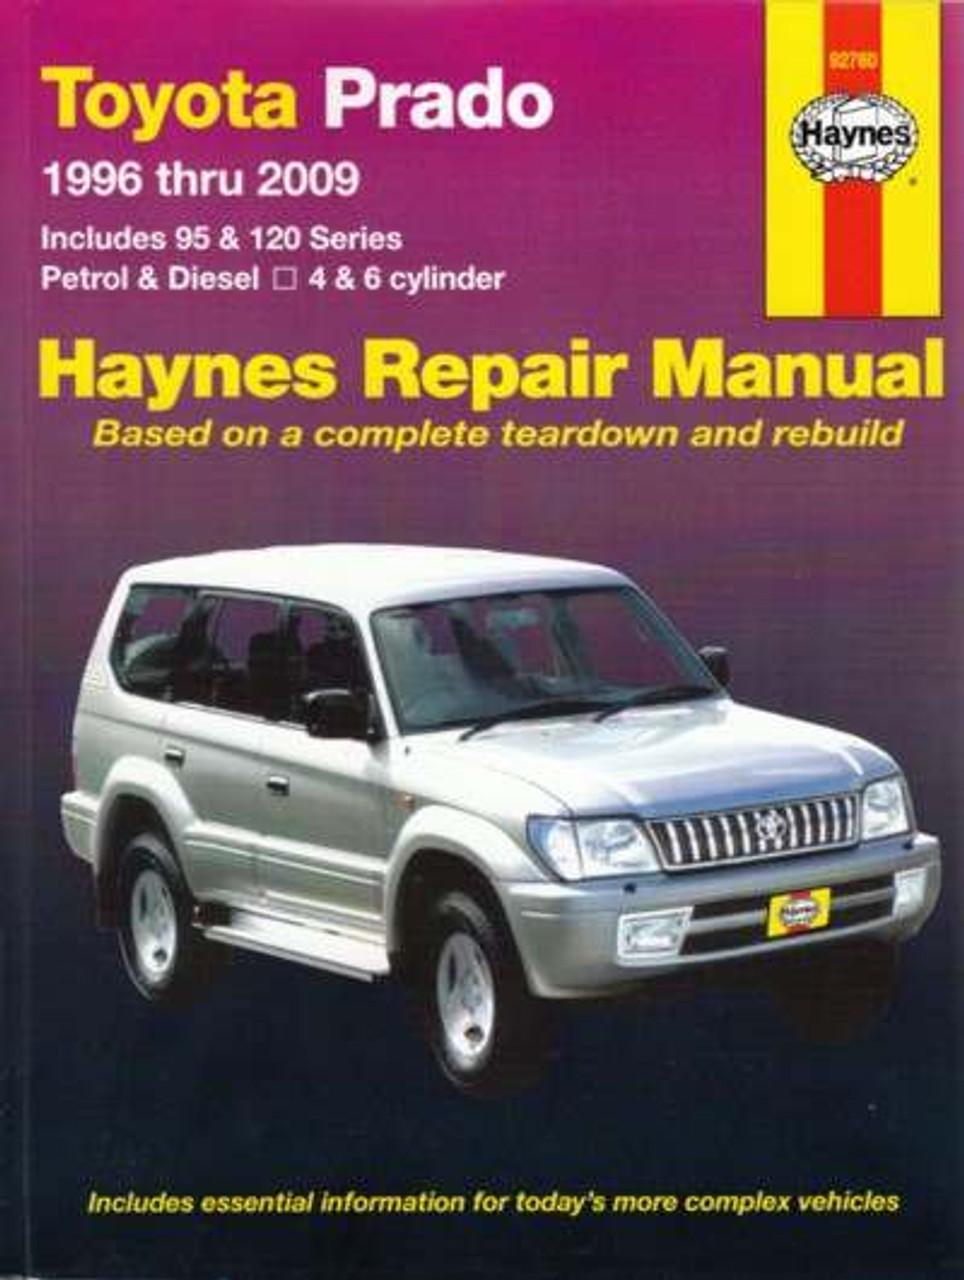 toyota prado 95 series workshop manual